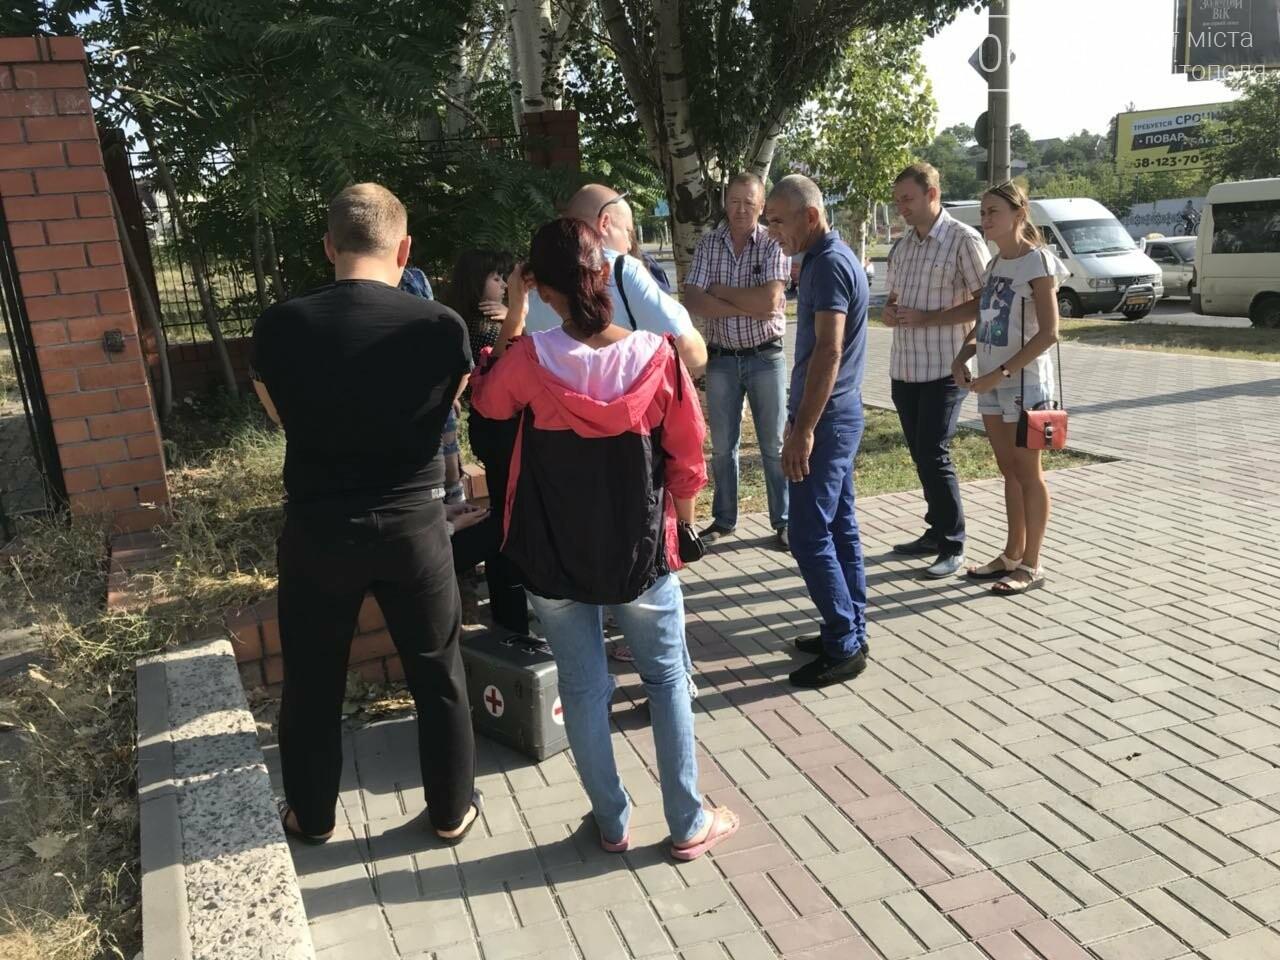 В Мелитополе на пешеходном переходе сбили девушку, - ФОТО, фото-6, Фото сайта 0619